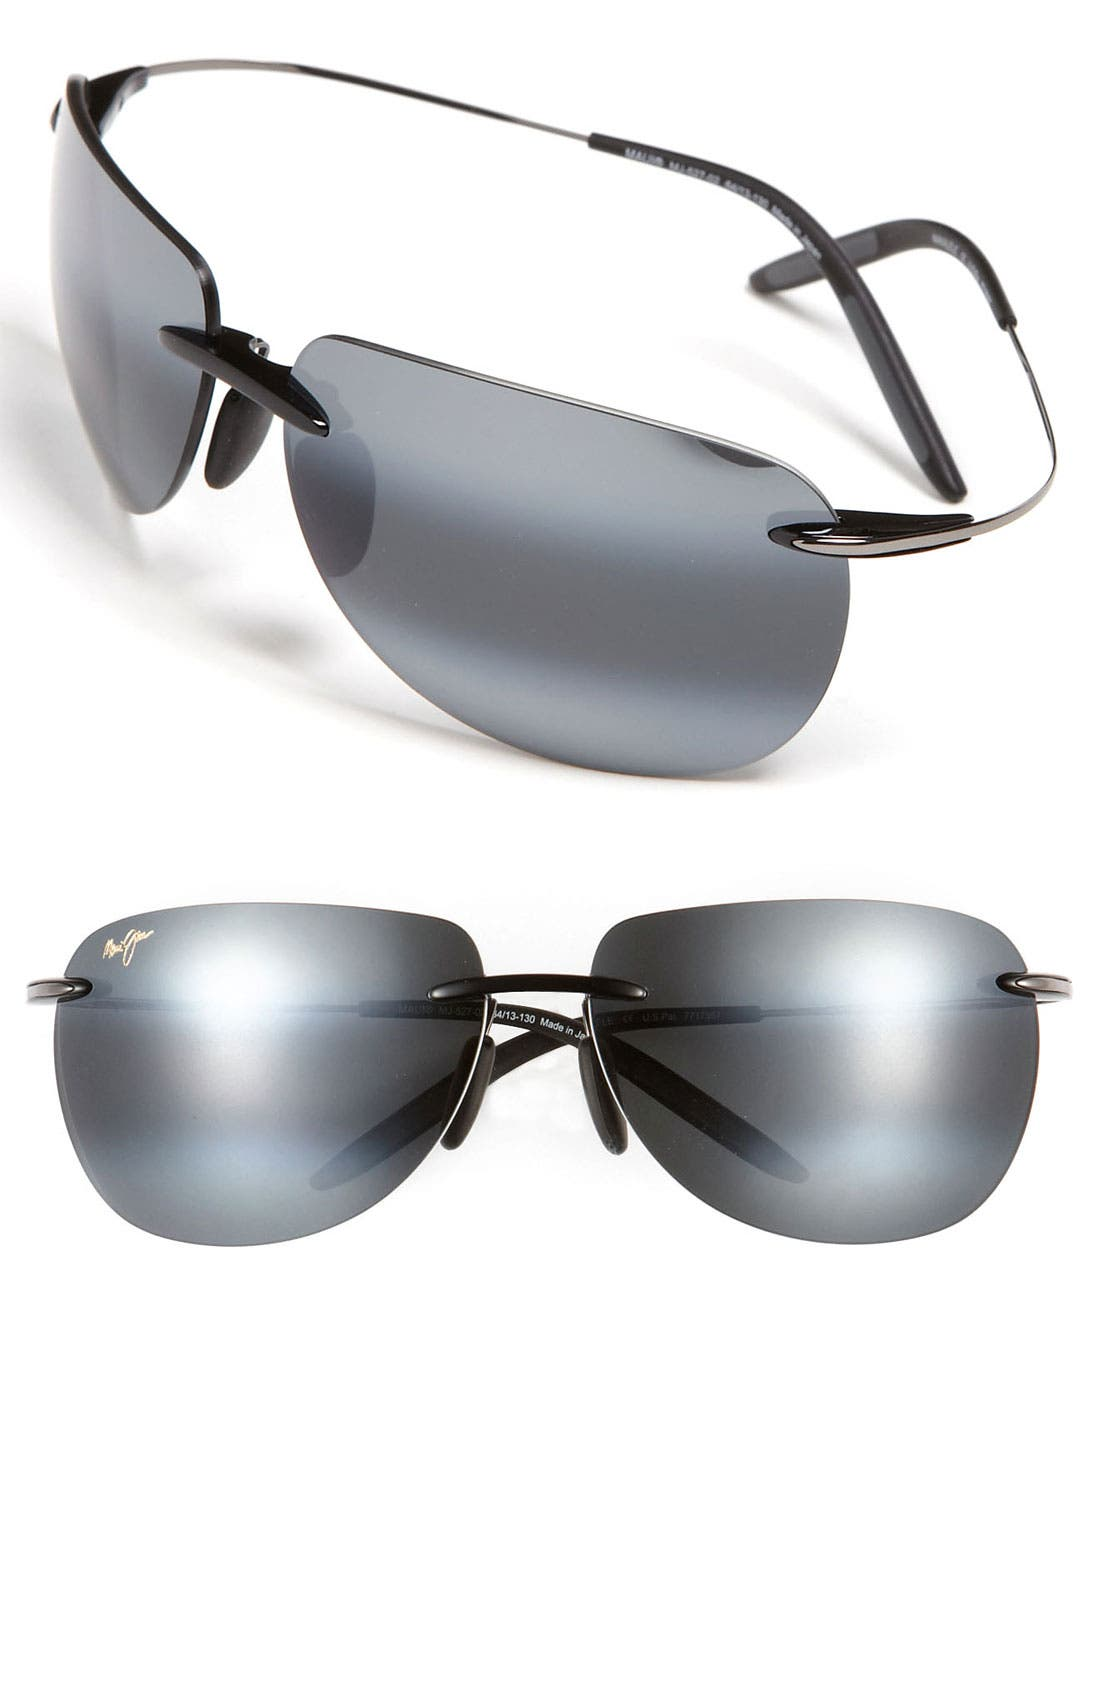 Main Image - Maui Jim 'Nakalele' PolarizedPlus®2 Rimless 64mm Sunglasses